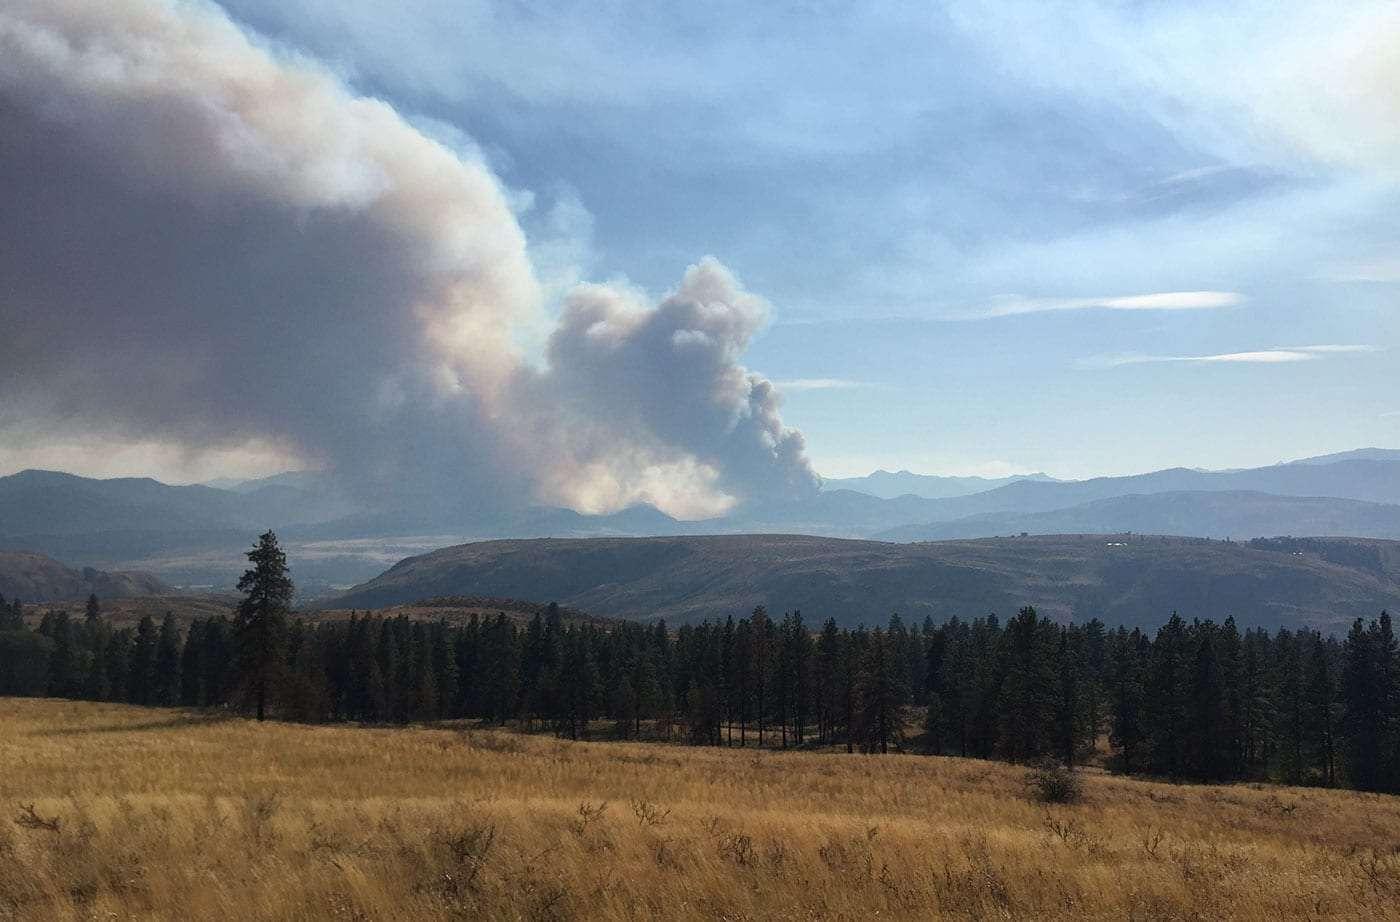 fire rising just over the horizon, near Twisp, Washington